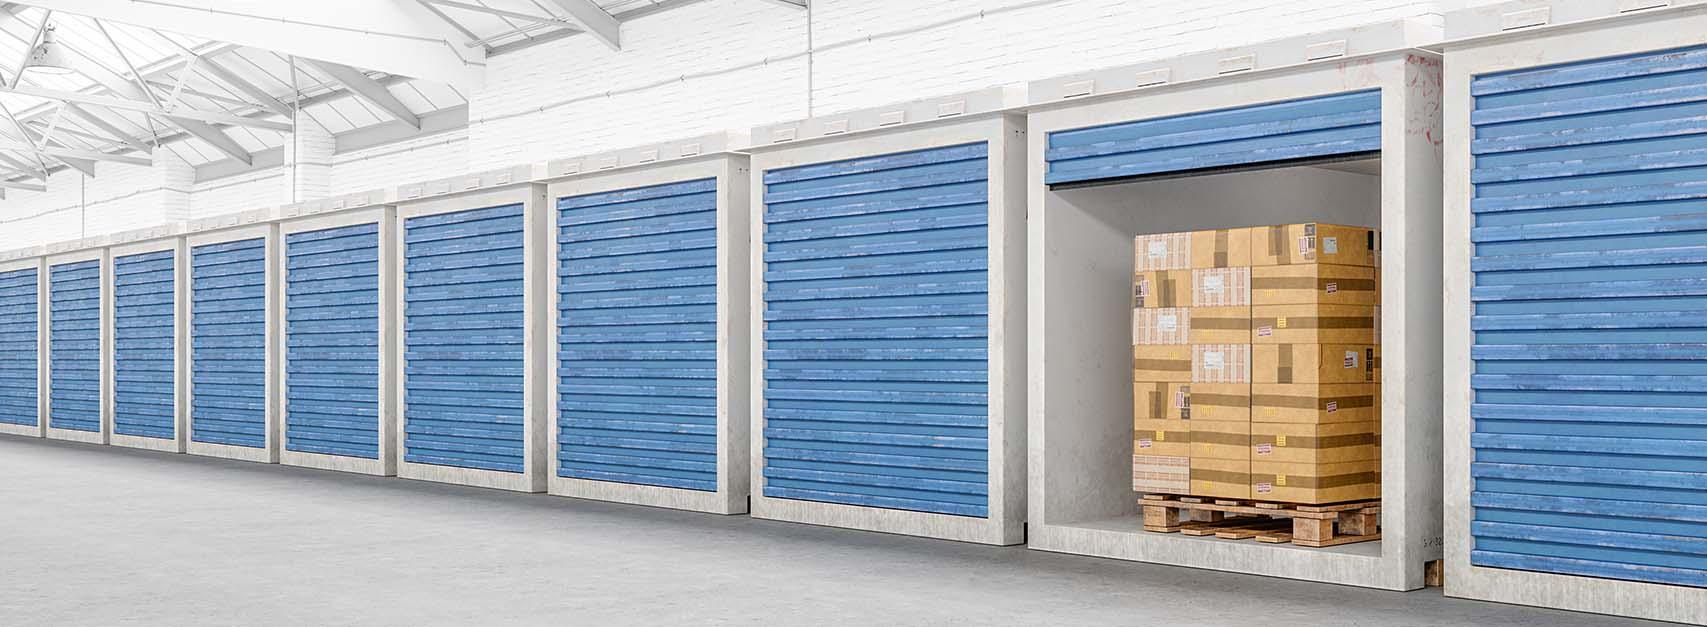 Types of Self Storage